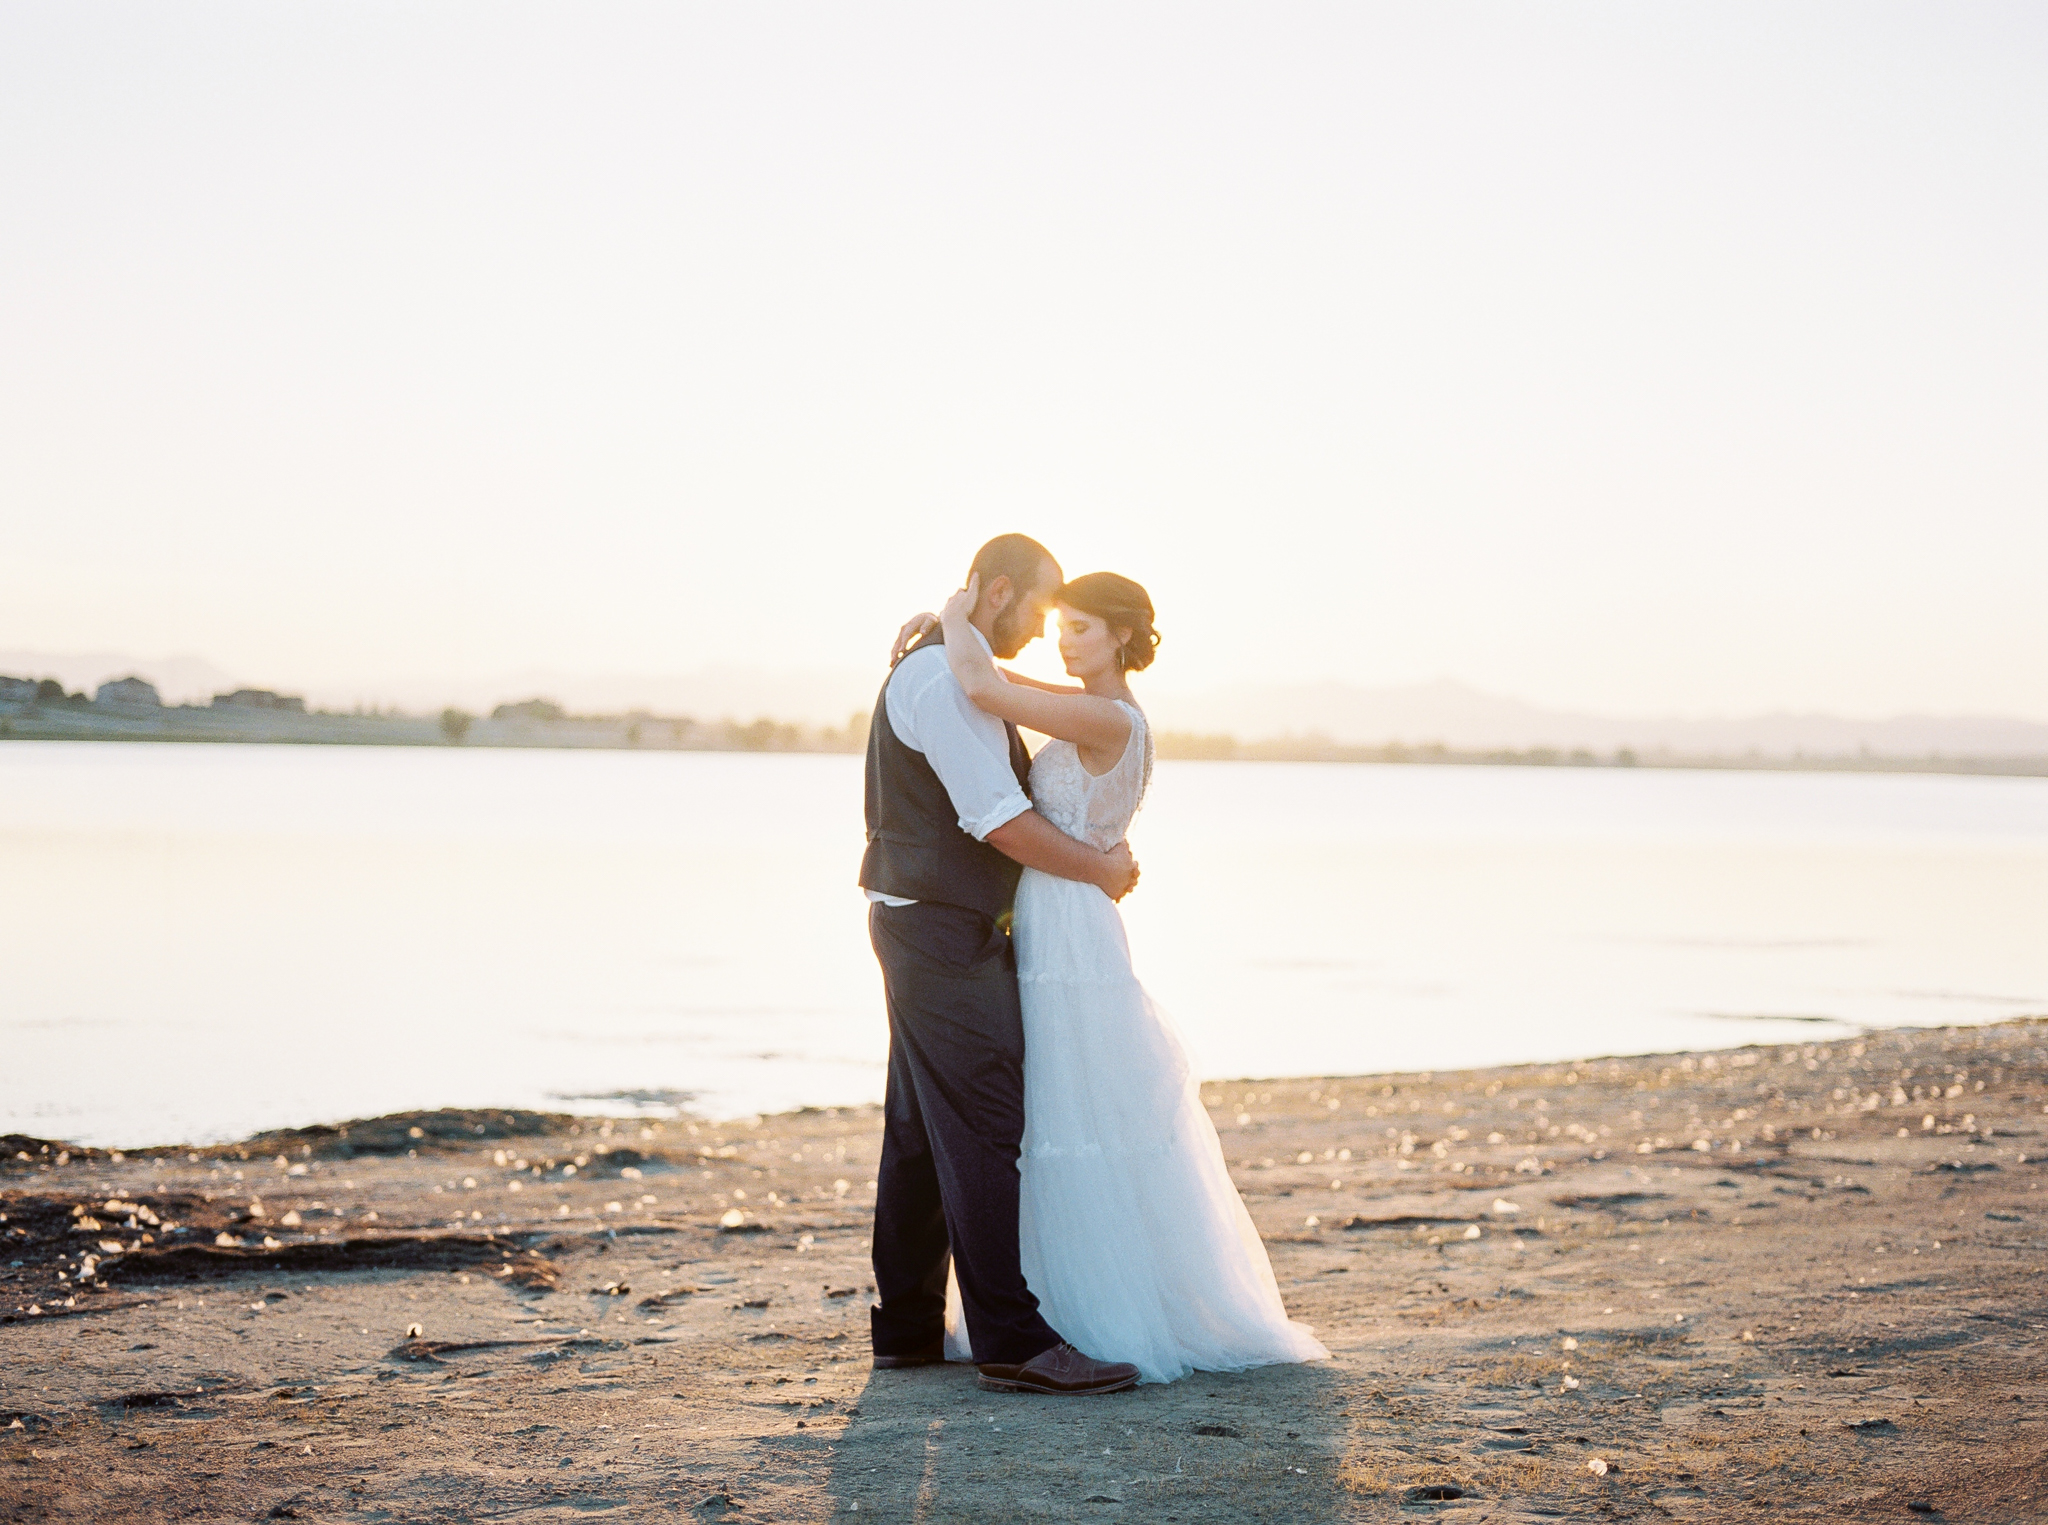 bride and groom ideas